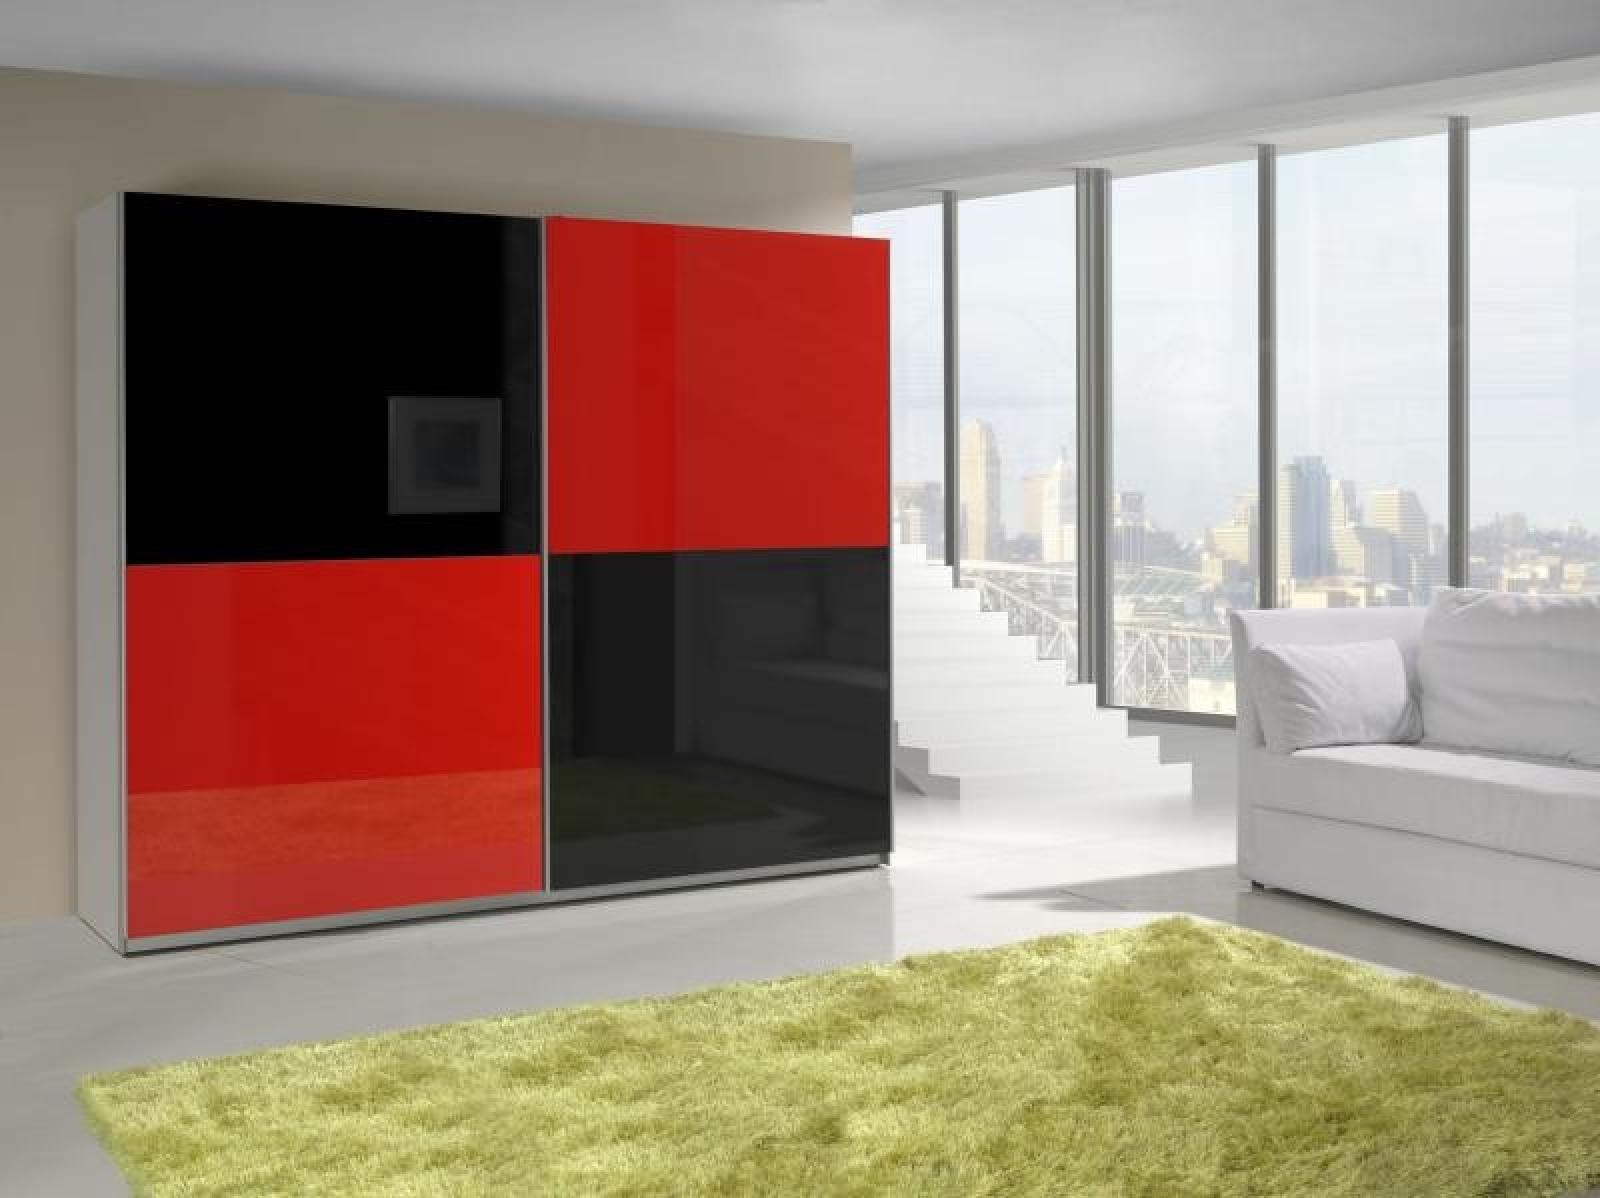 kaufexpert schwebet renschrank 244 cm prestige 16 rot. Black Bedroom Furniture Sets. Home Design Ideas